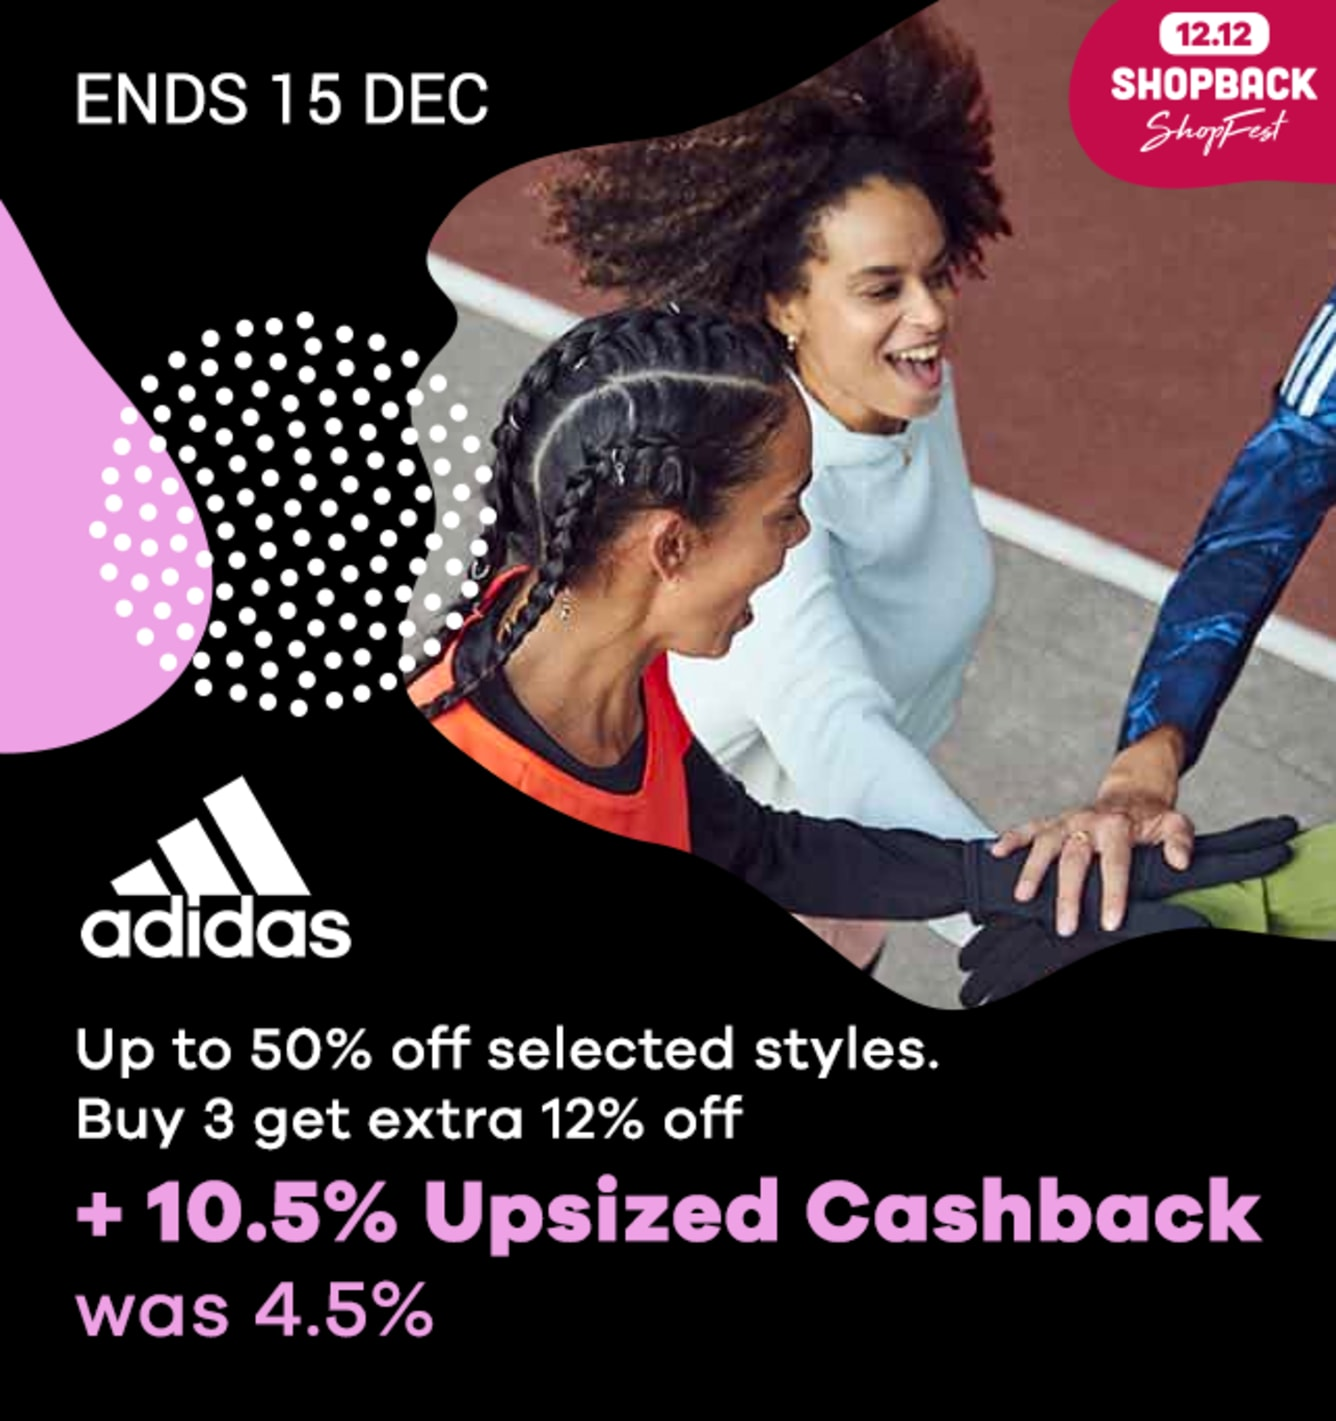 Adidas Special Upsize Cashback ShopFest